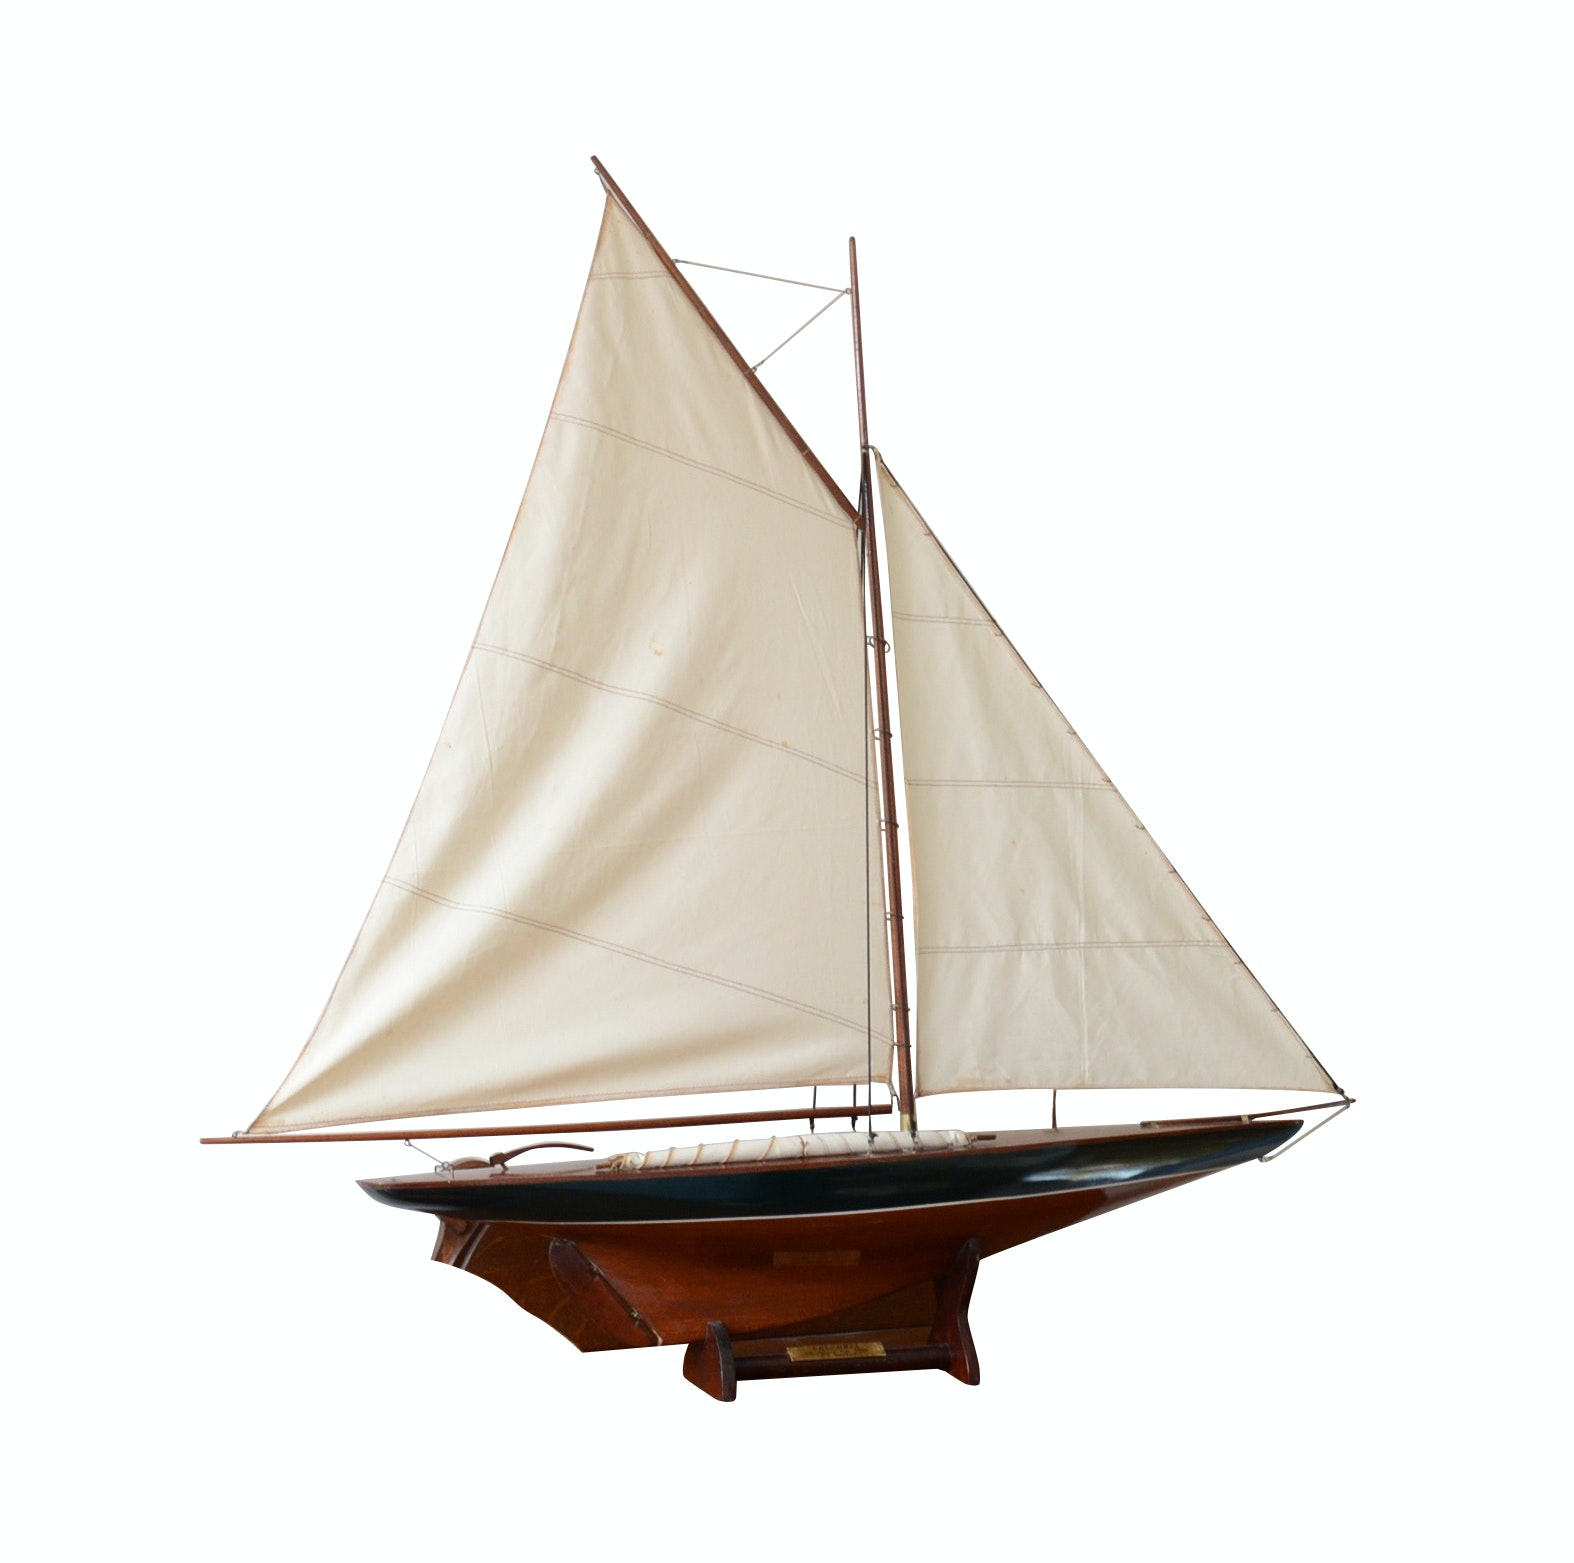 Columbia, America's Cup, 1901 Scale Model Sailboat